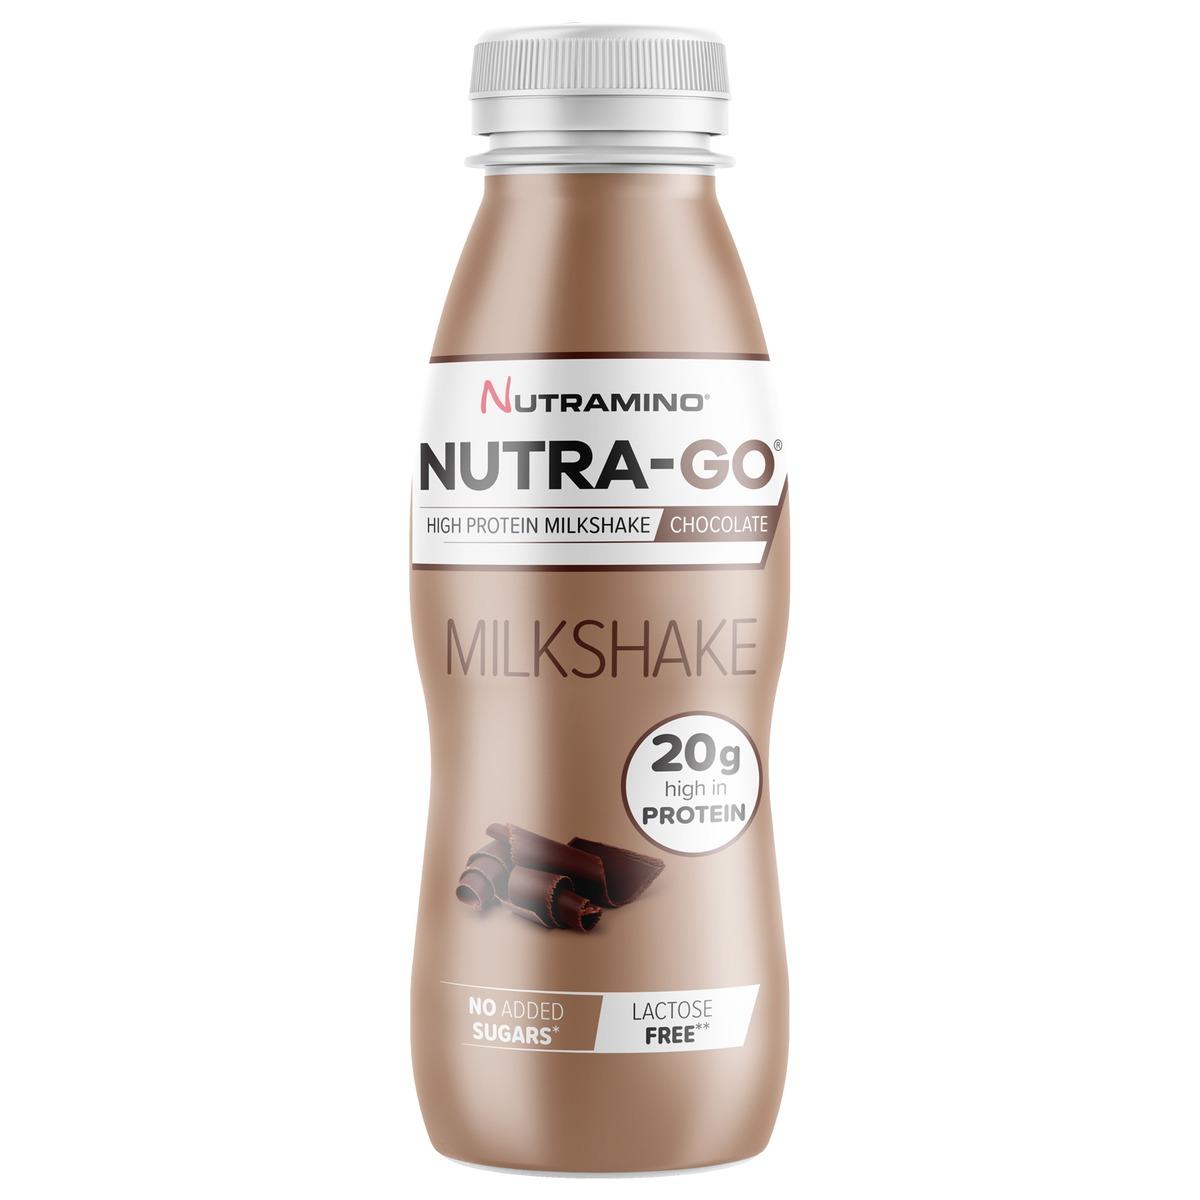 Nutramino Milkshake